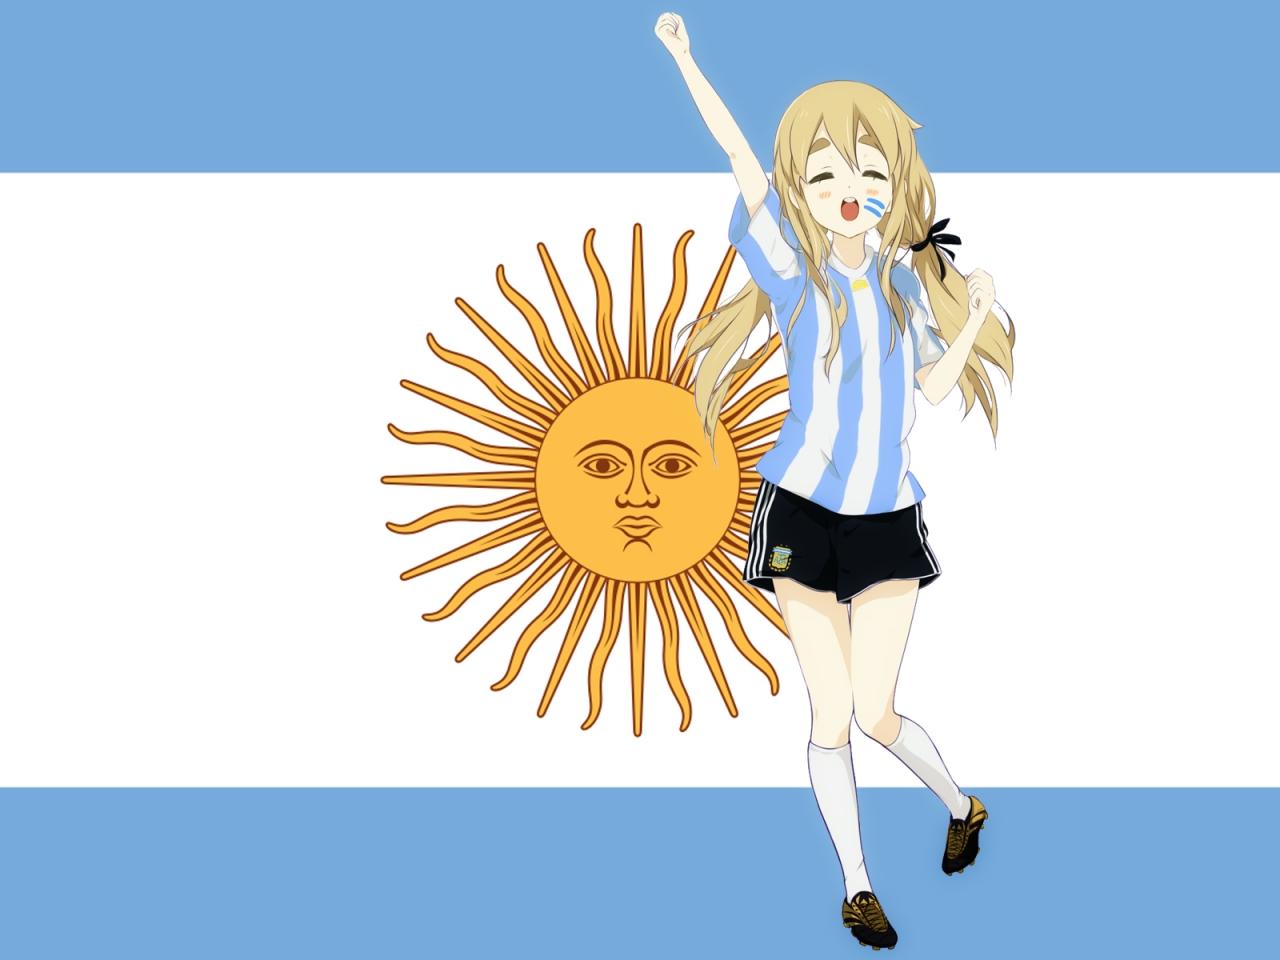 Chica K-ON de Argentina - 1280x960